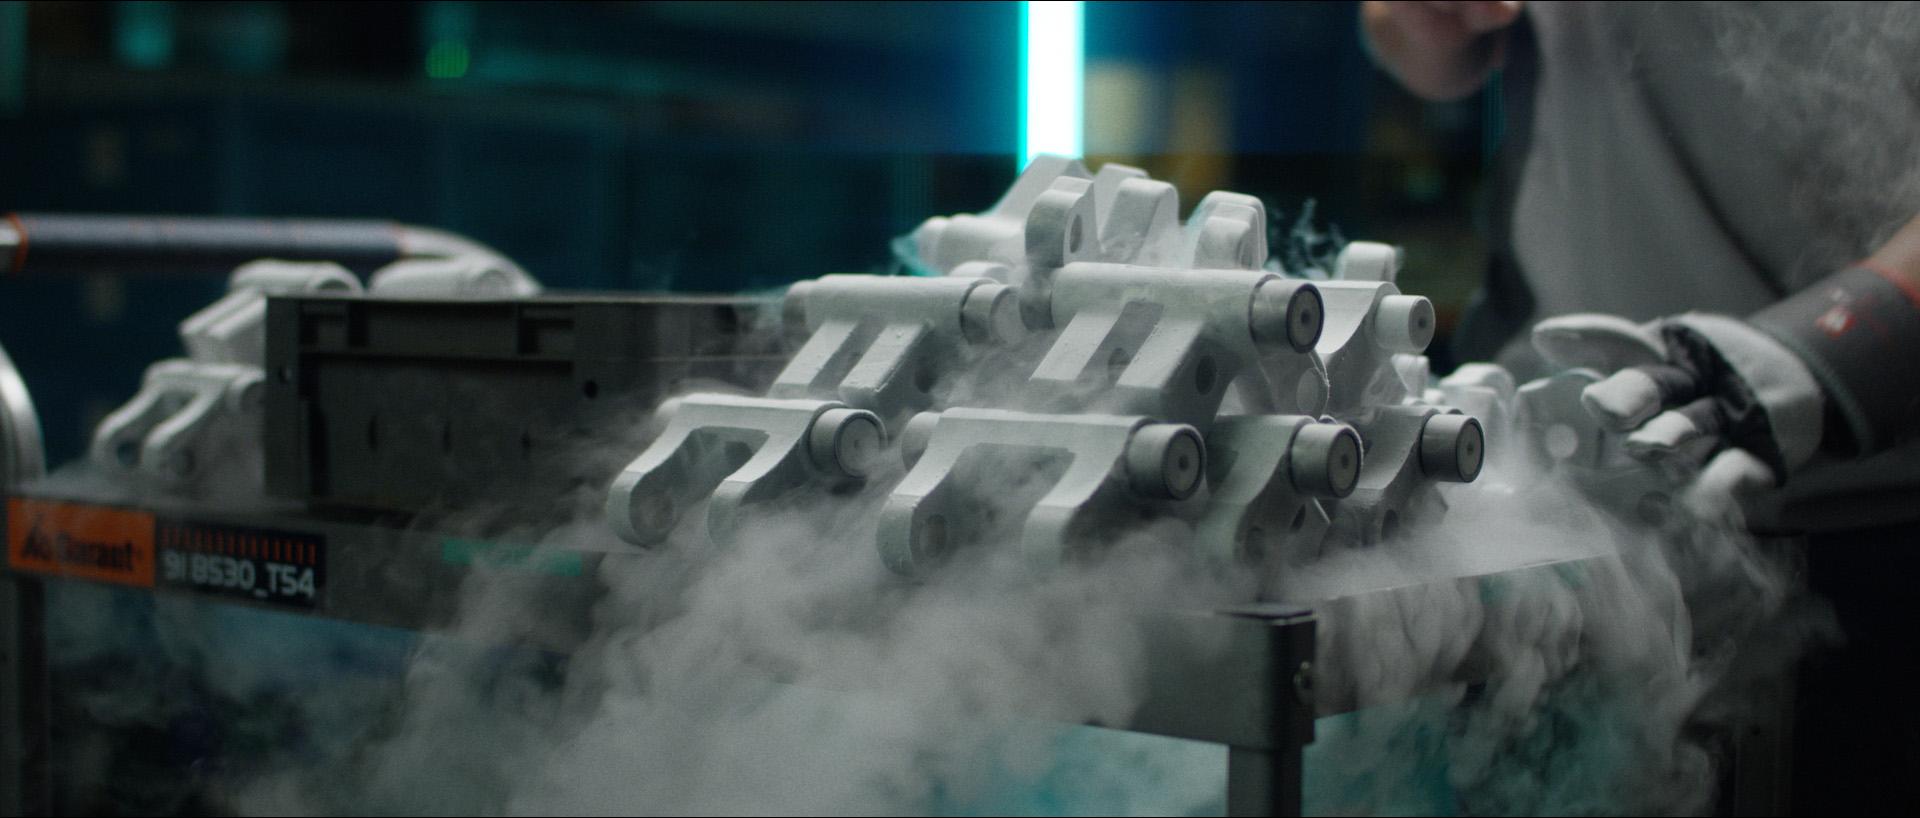 Karl-Mayer-Texture-Machine-Production-Textile_04.jpg